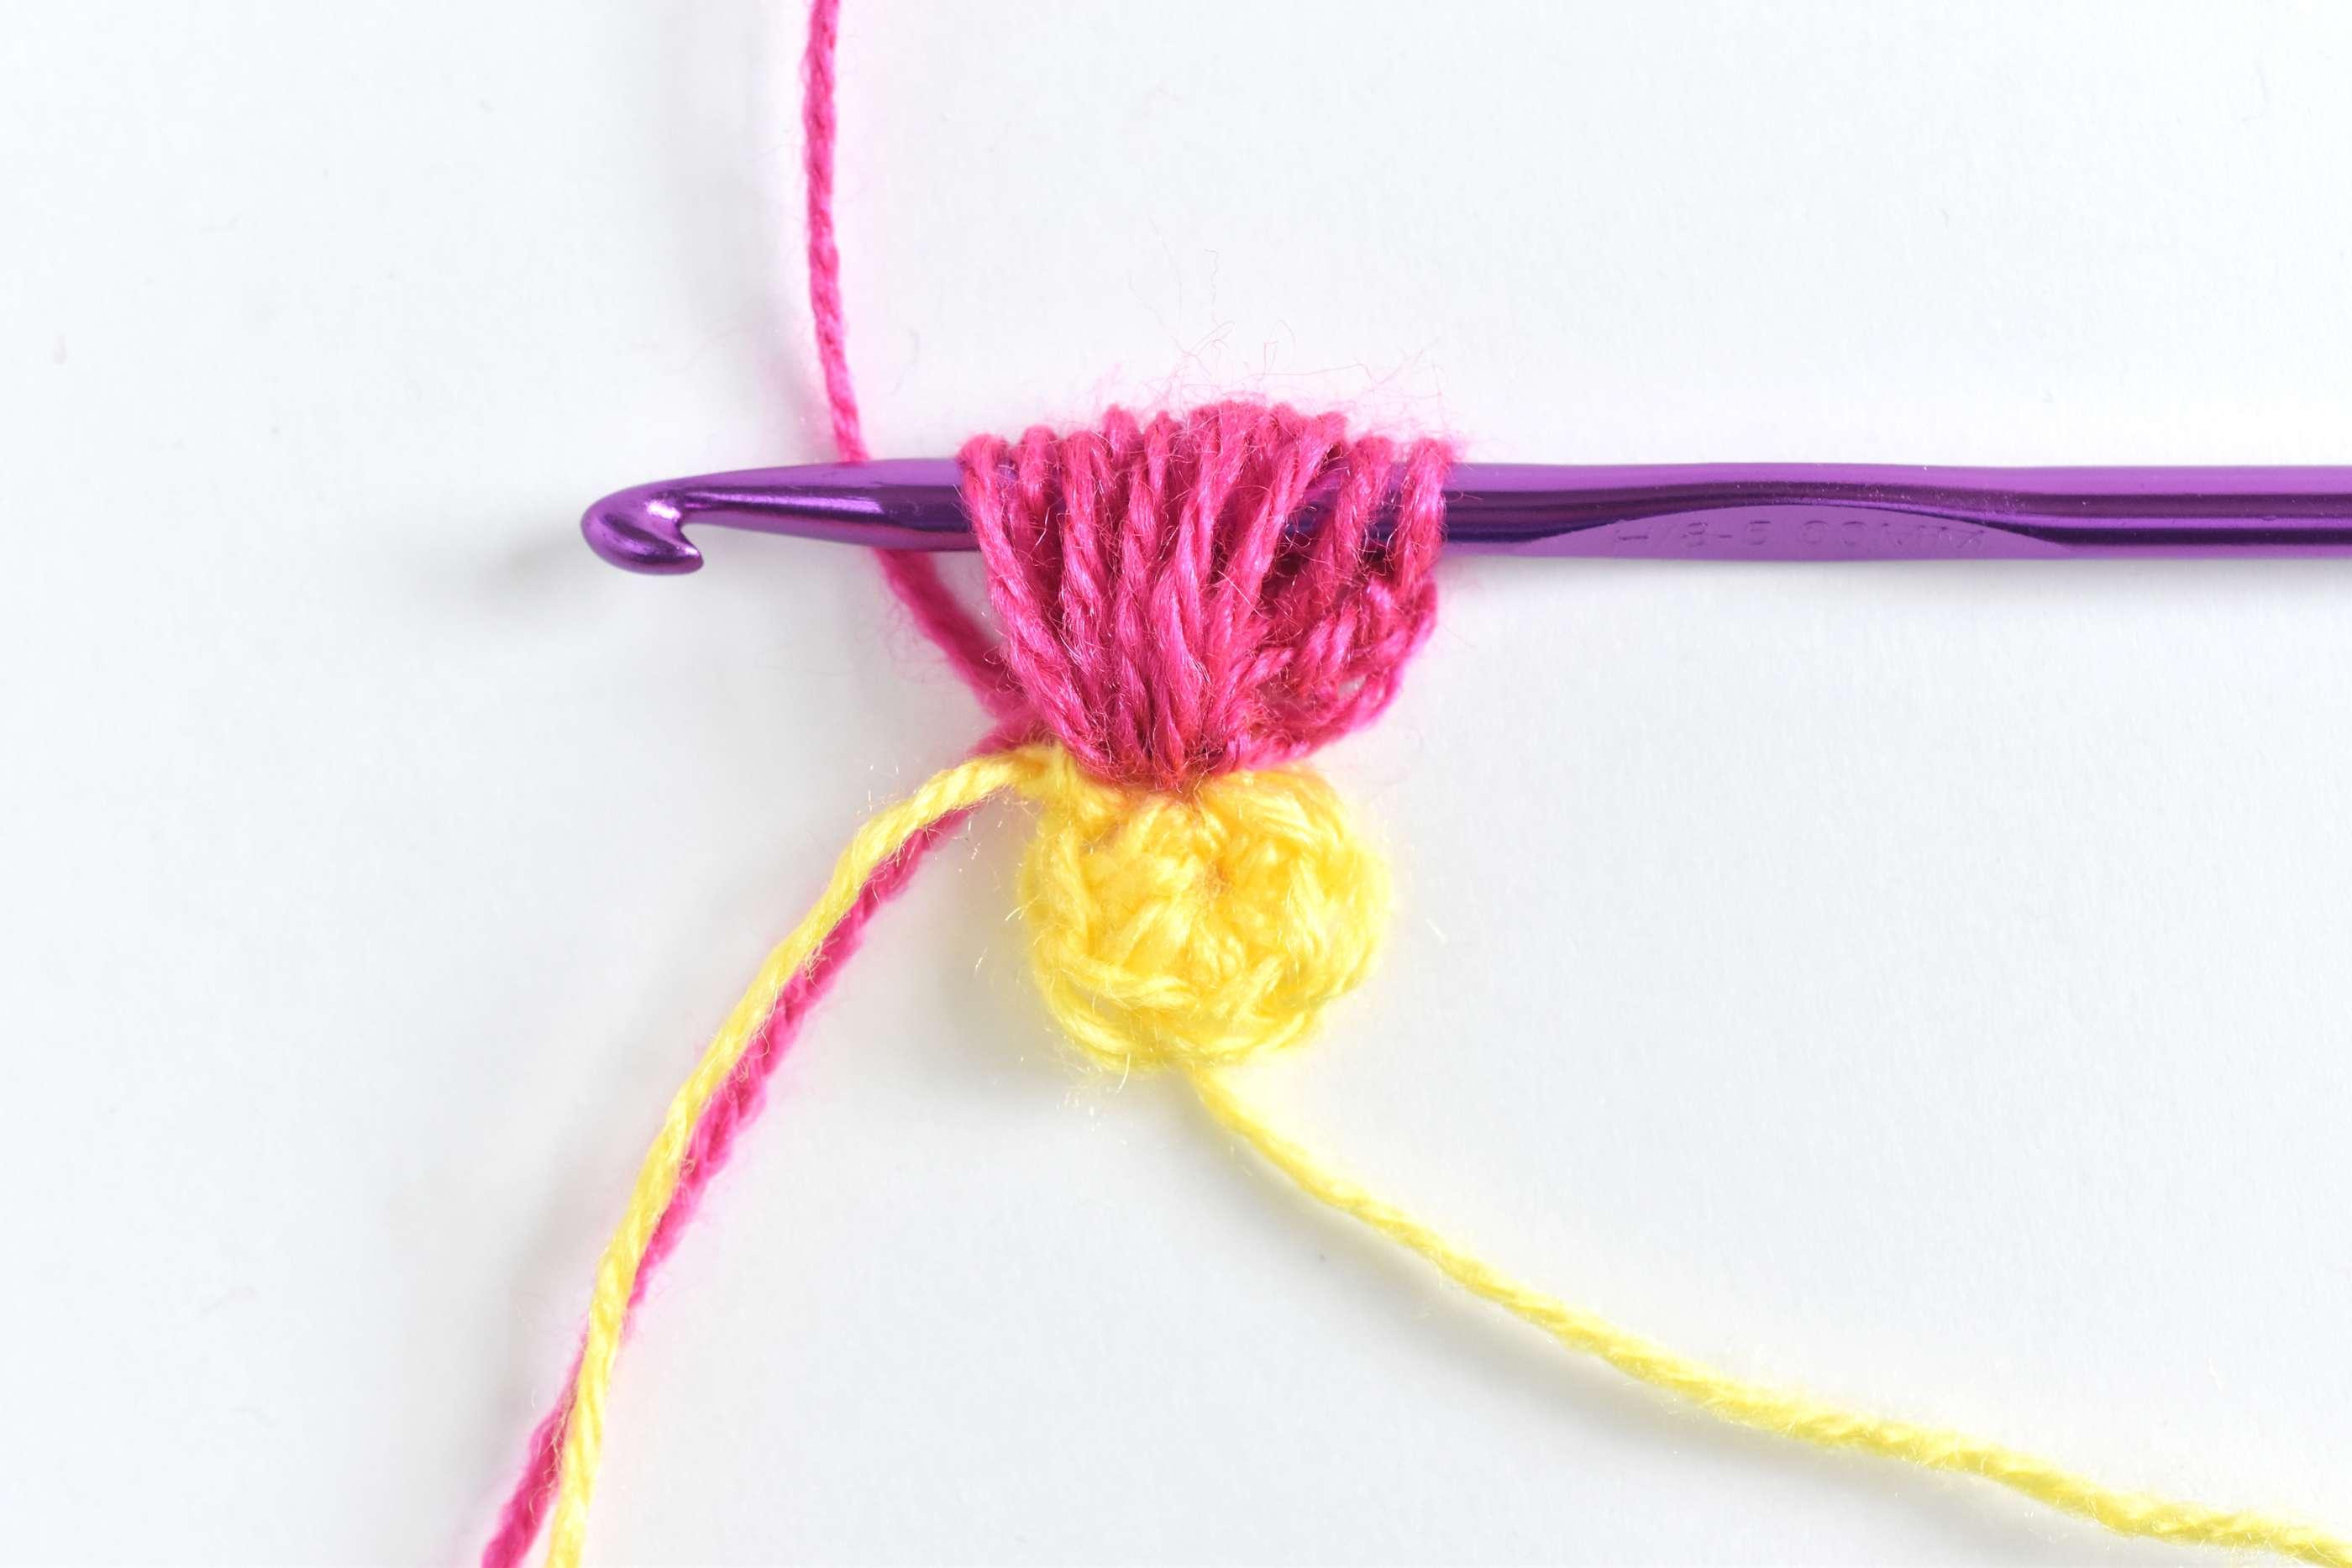 Crochet loops on a hook making a puff stitch petal